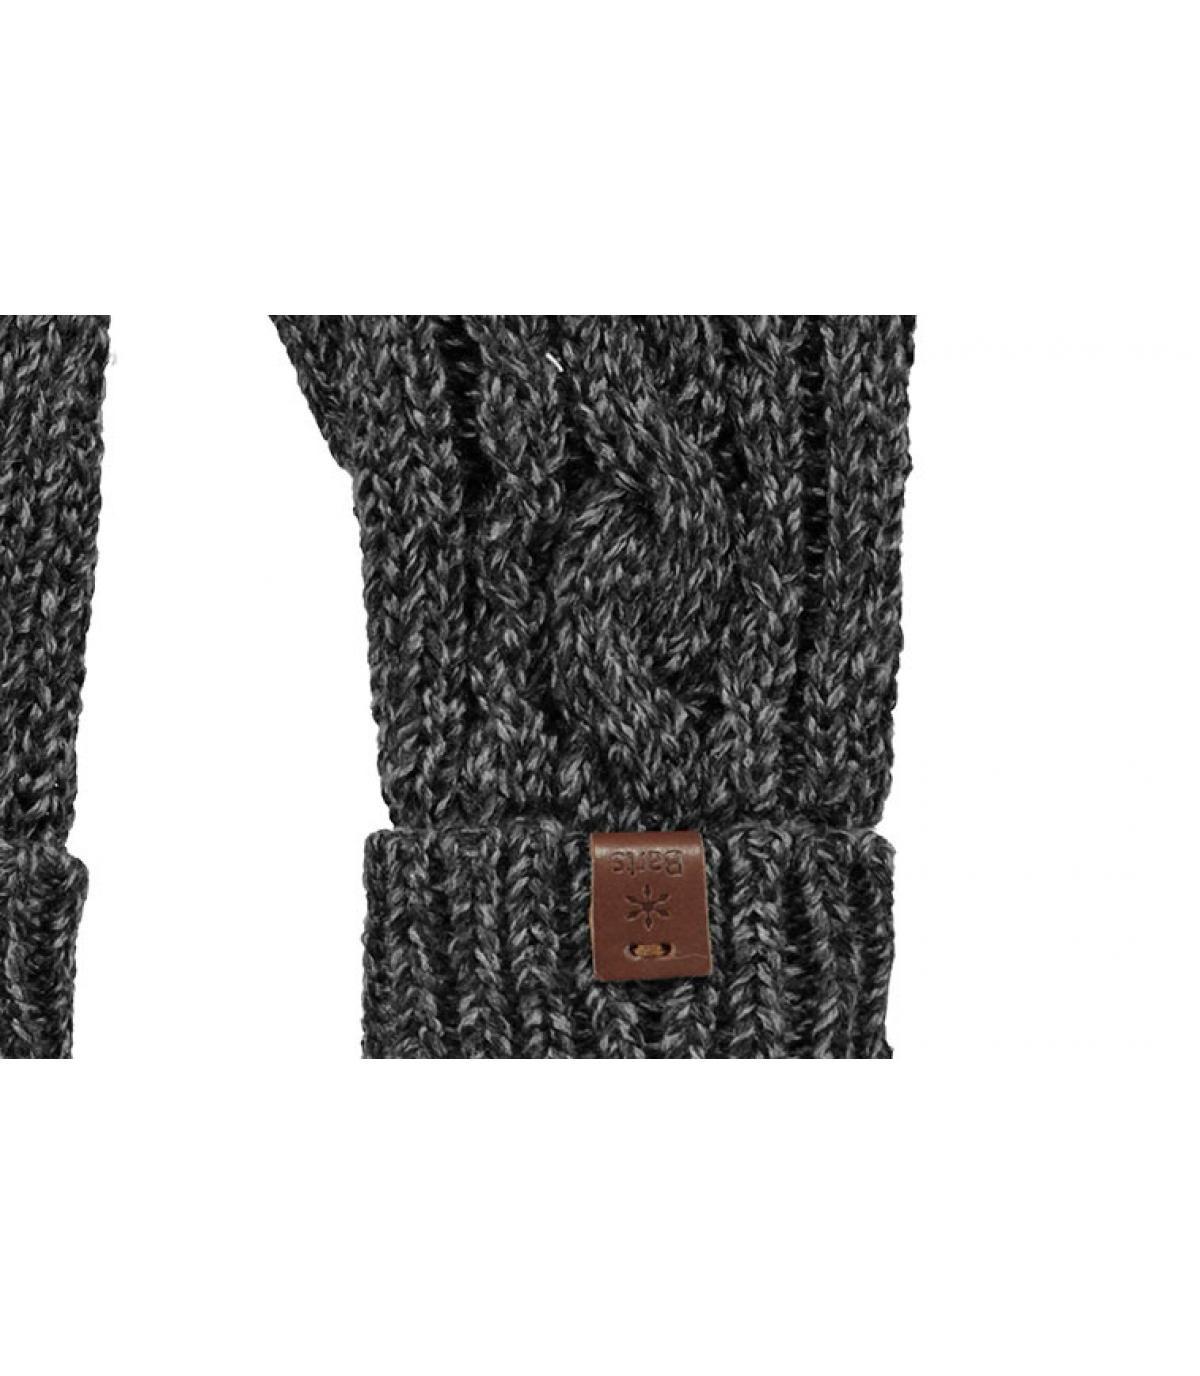 Detalles Twister Gloves black imagen 3